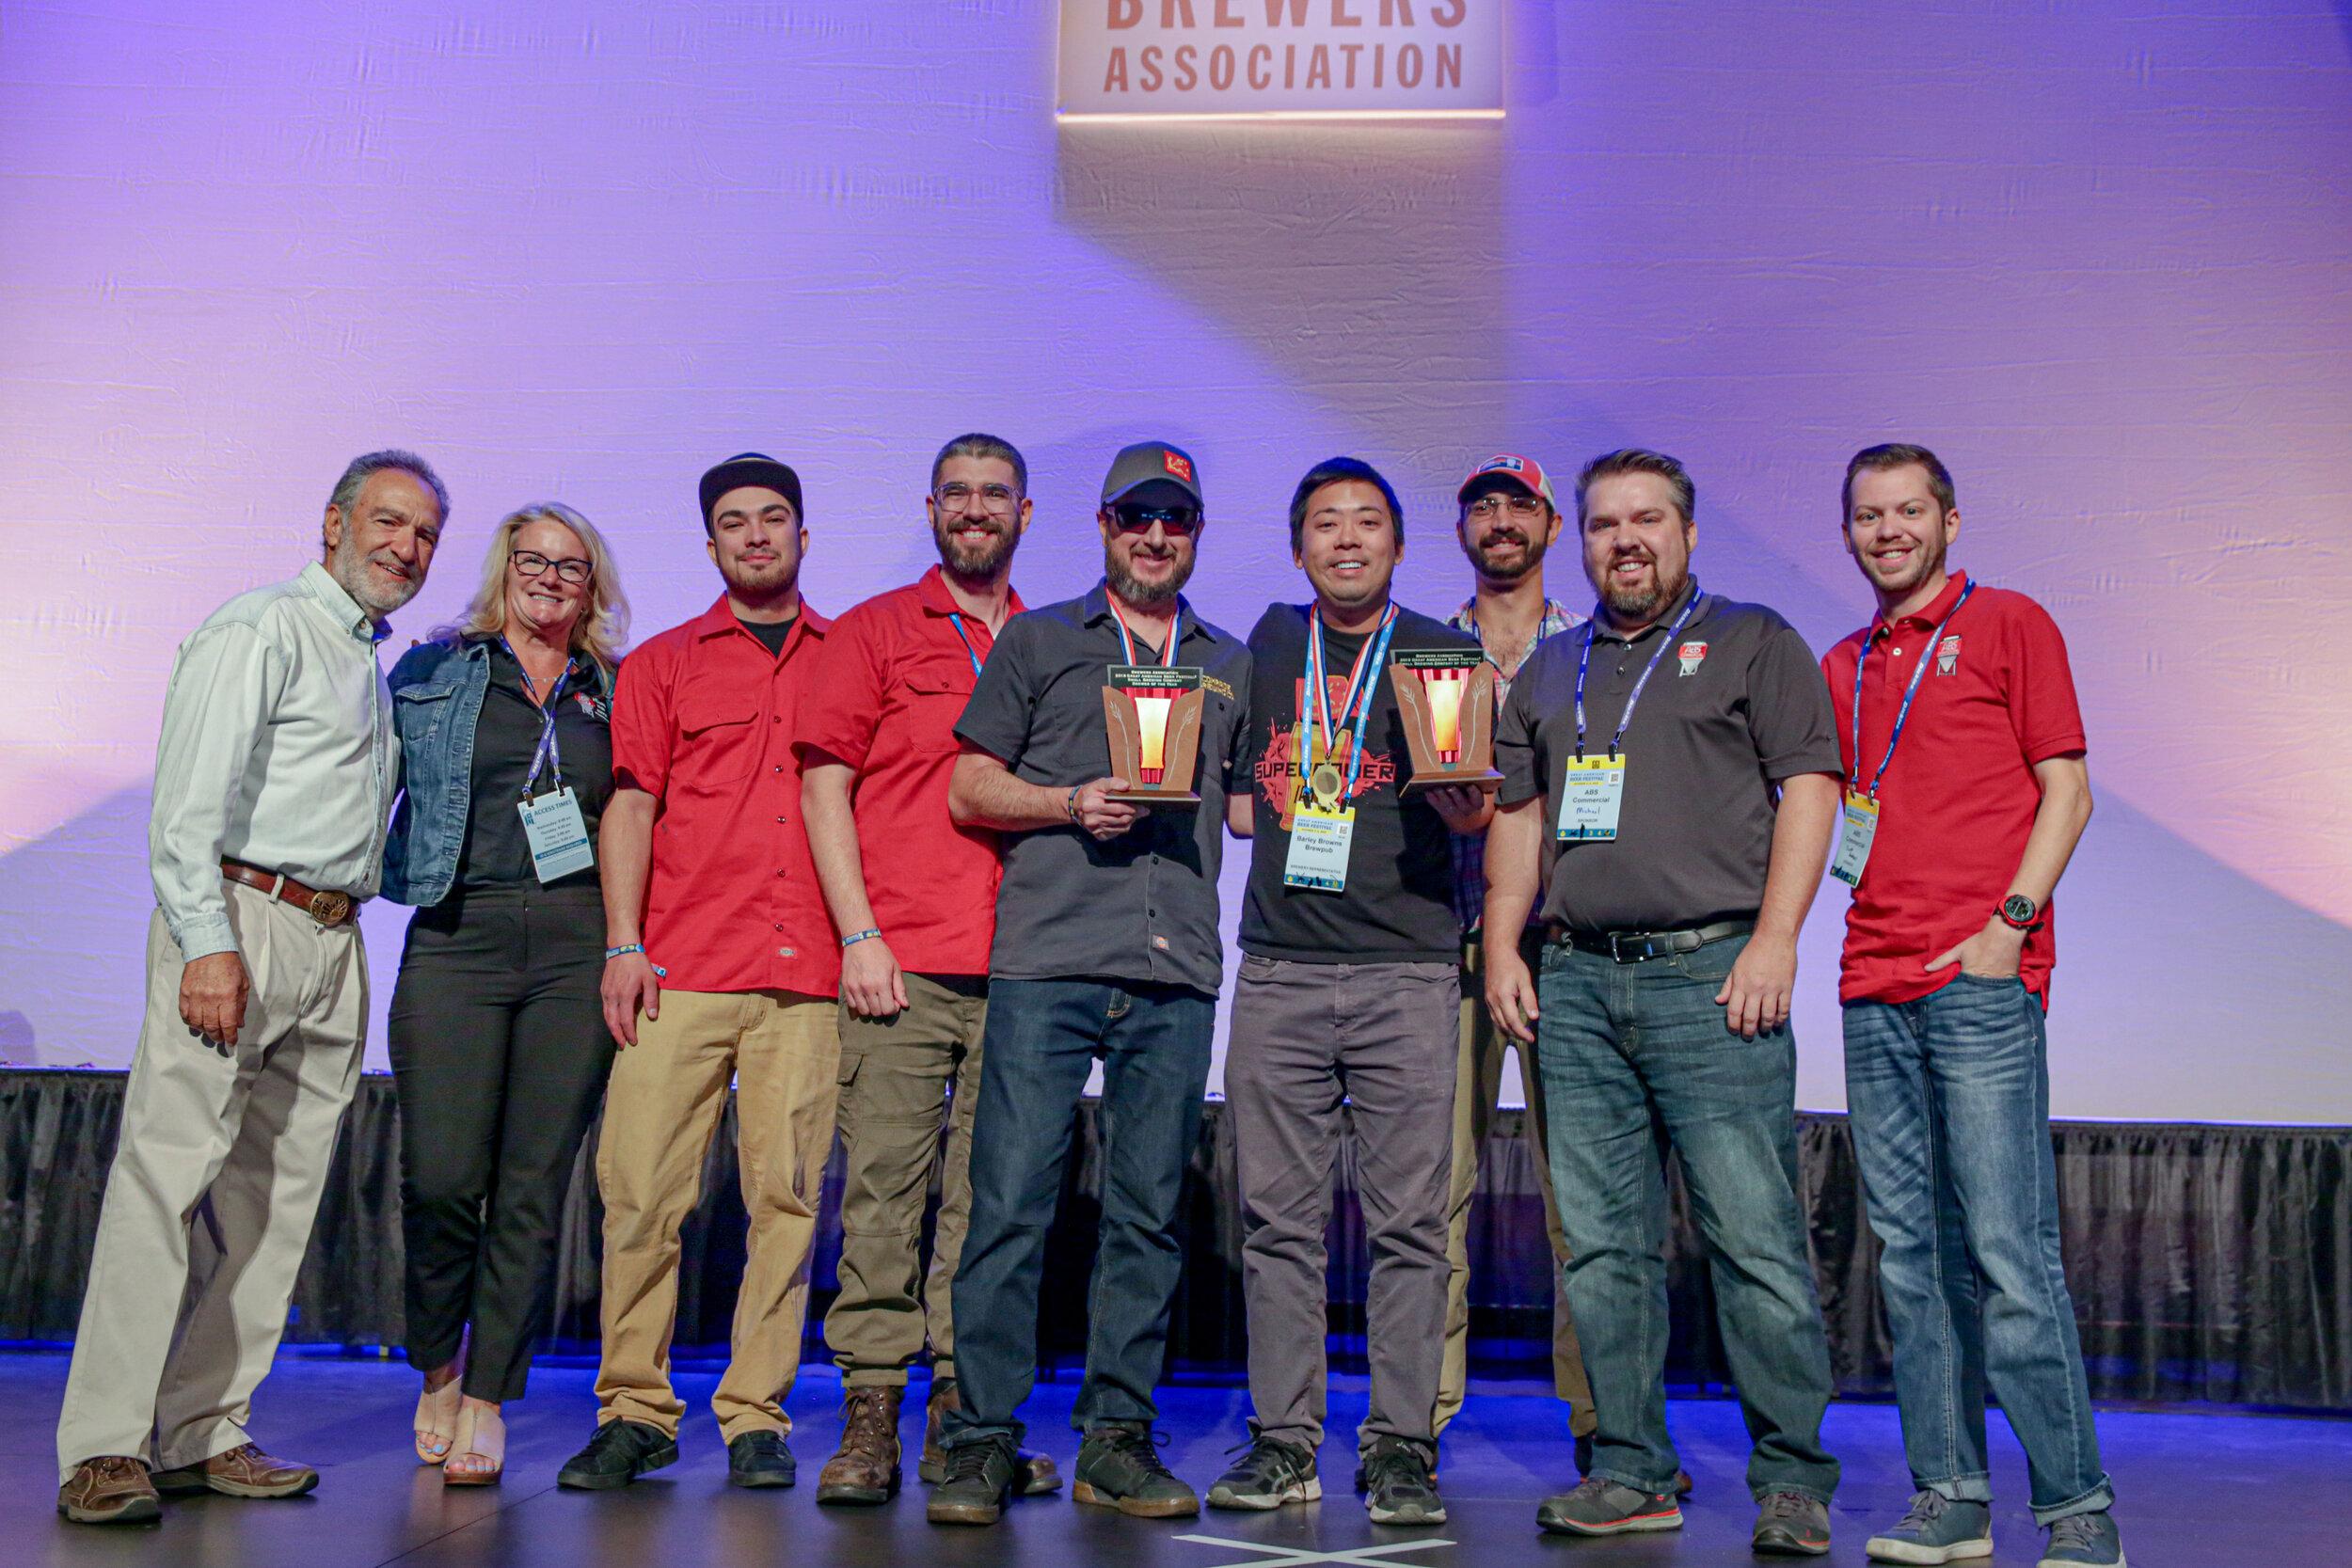 The Comrade Brewing Team receiving their award. Photo ©  Brewers Association